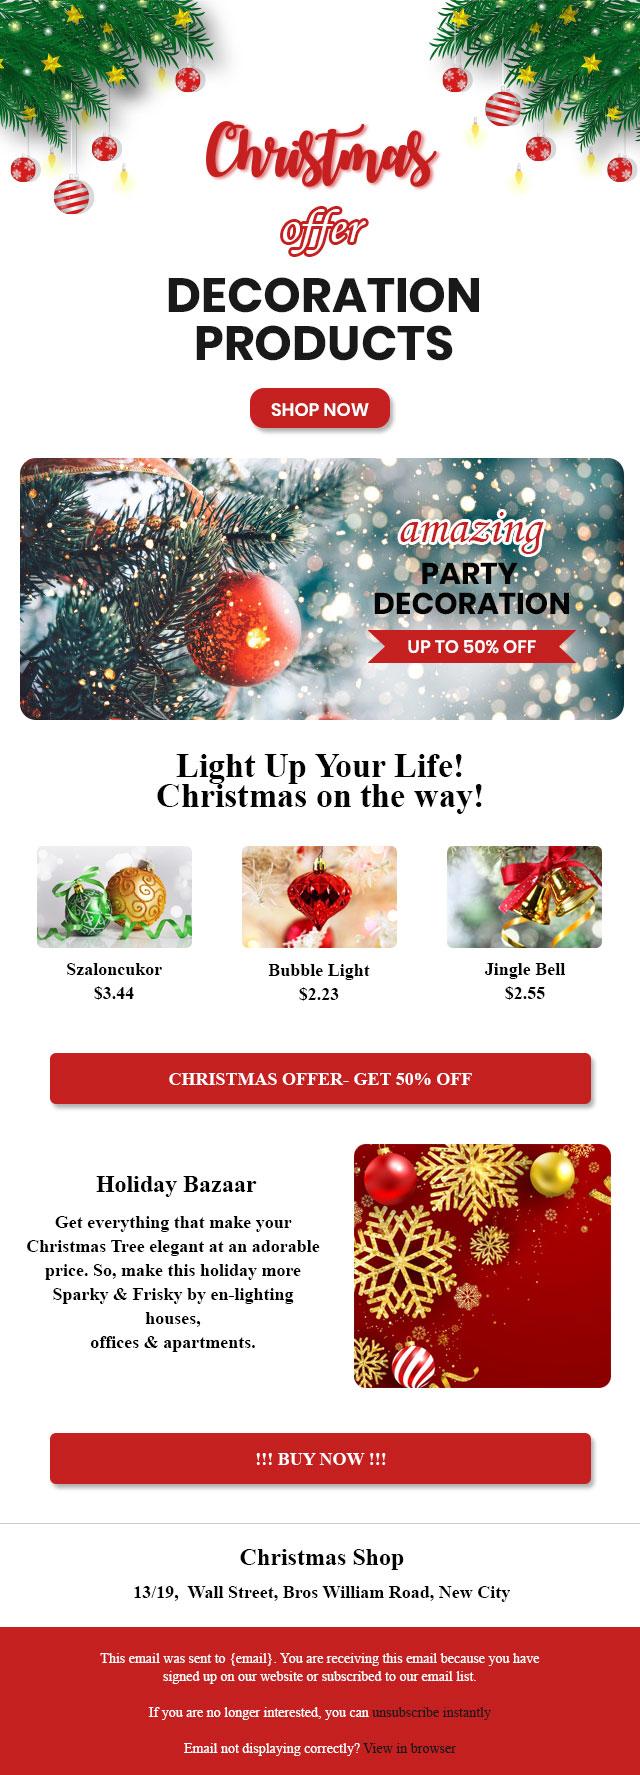 30 Free Christmas Email Templates   BayEngage